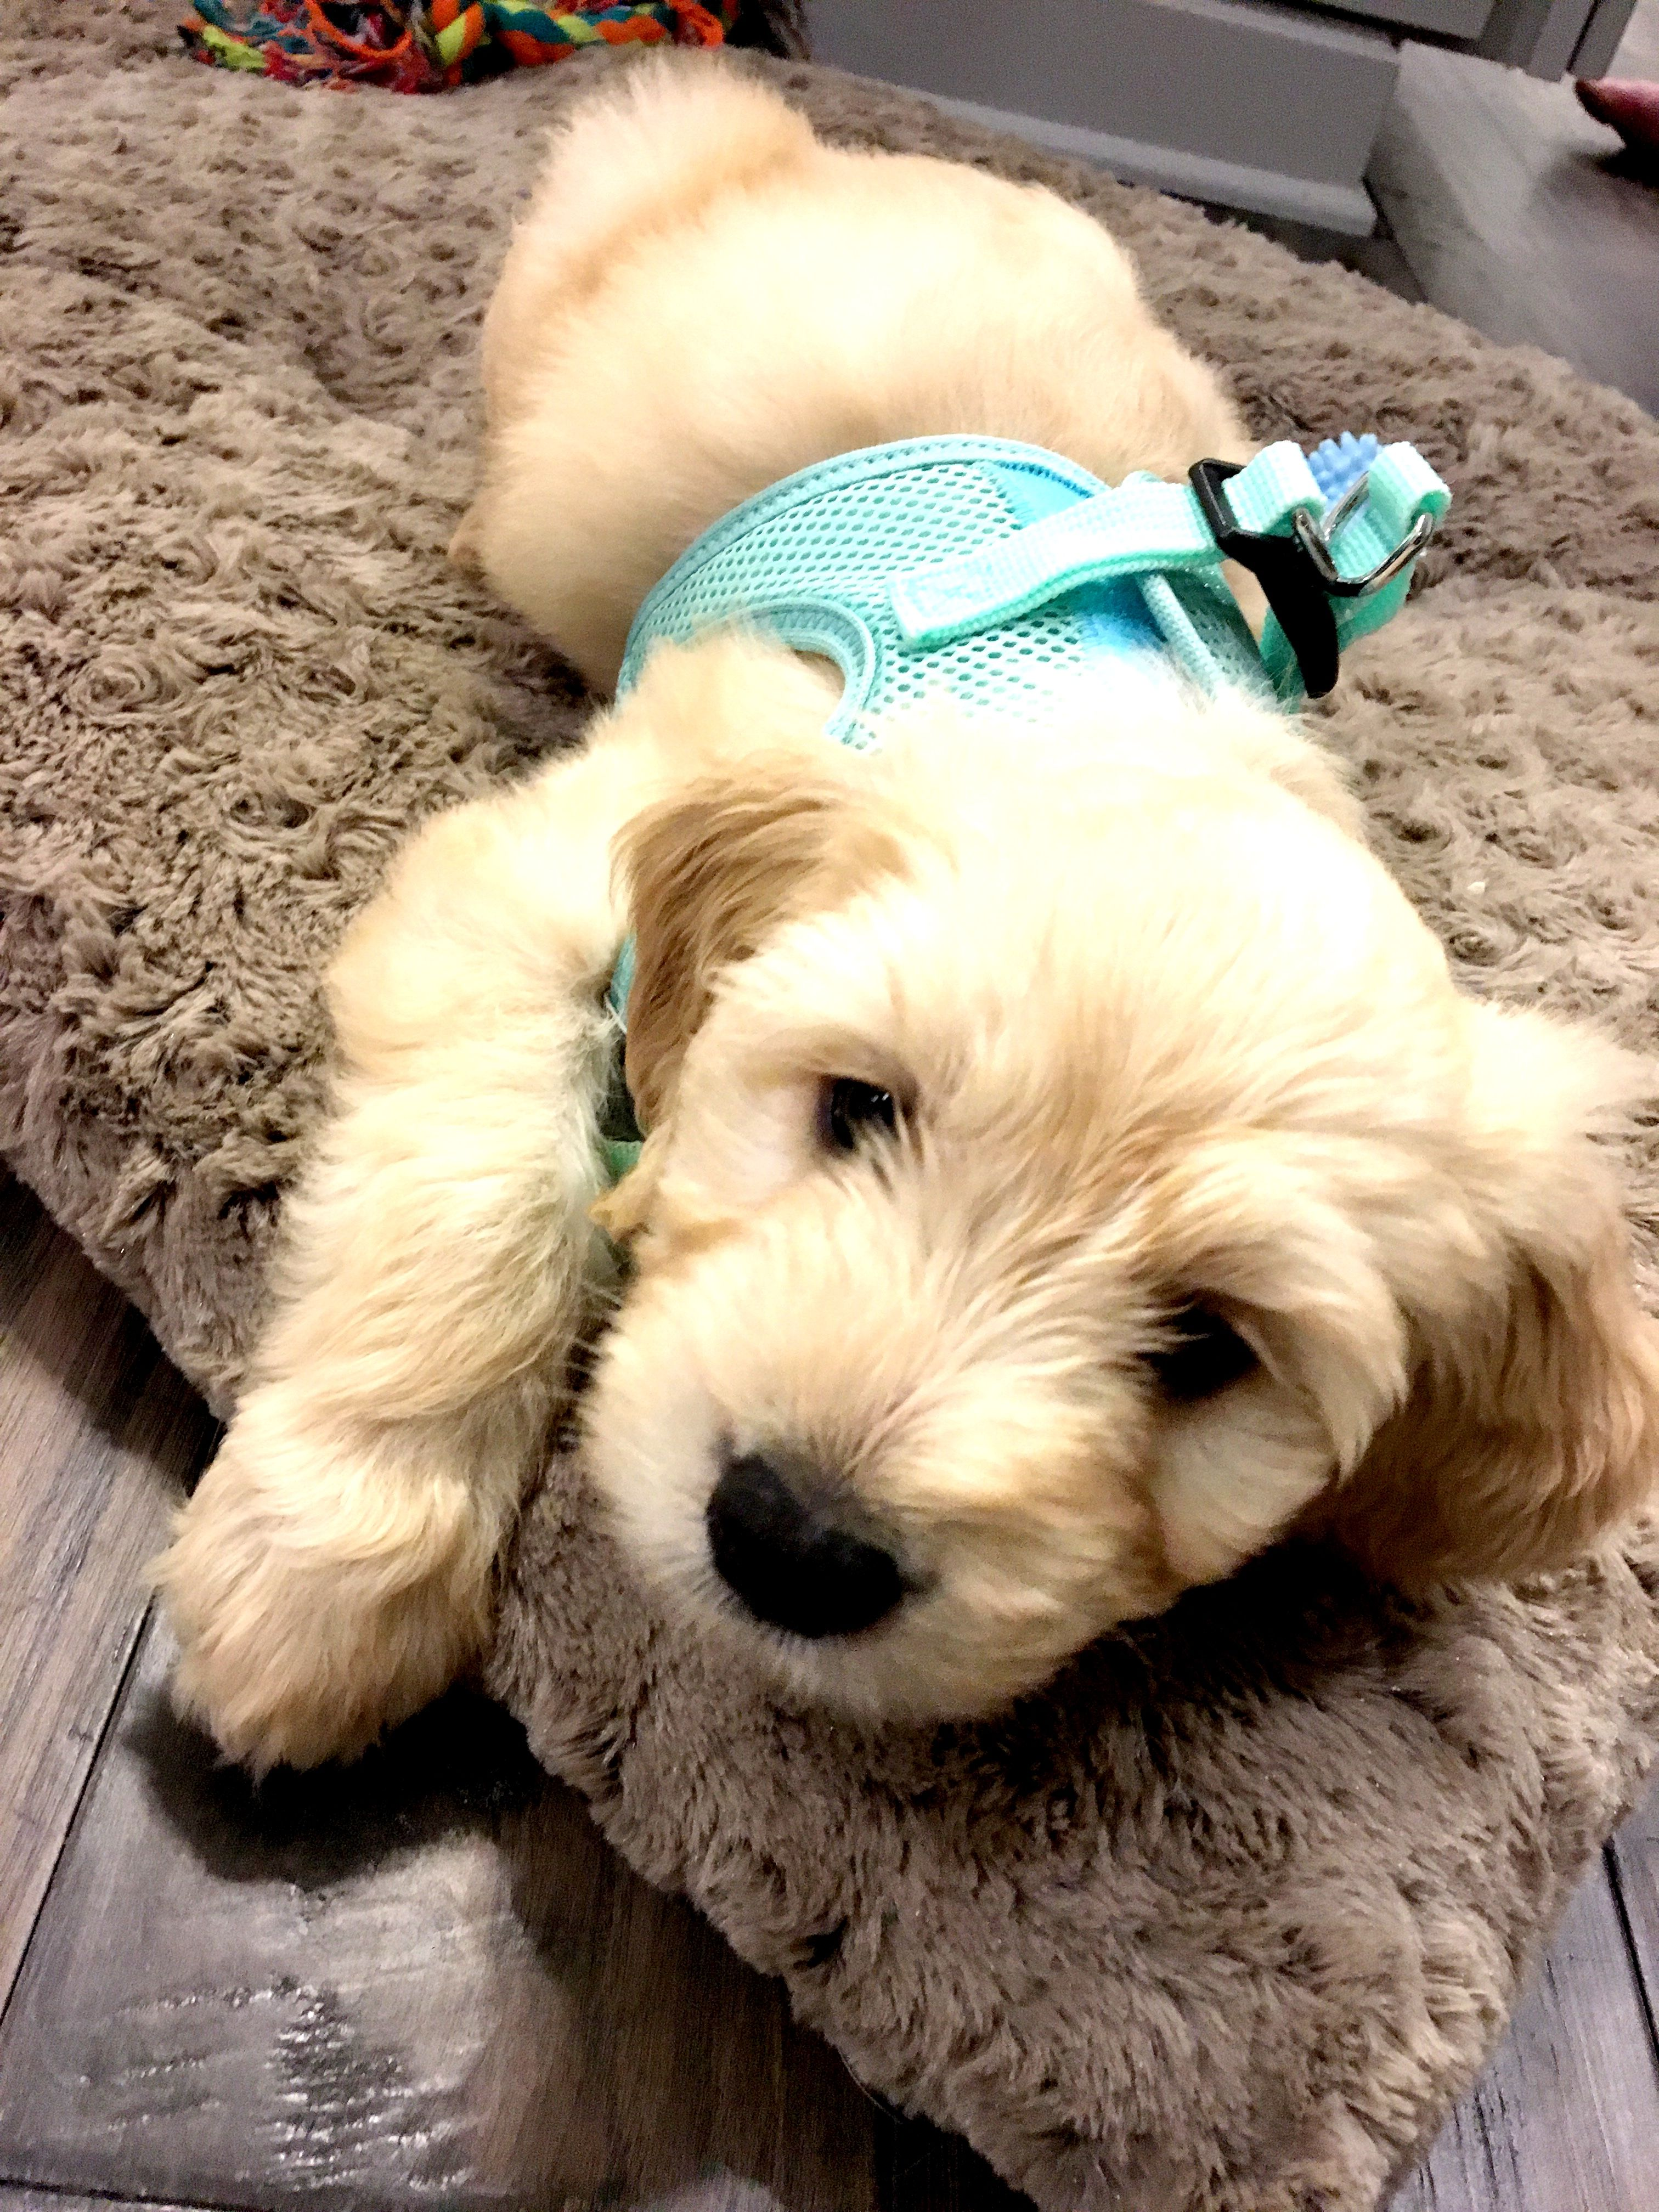 Pin on Puppies!